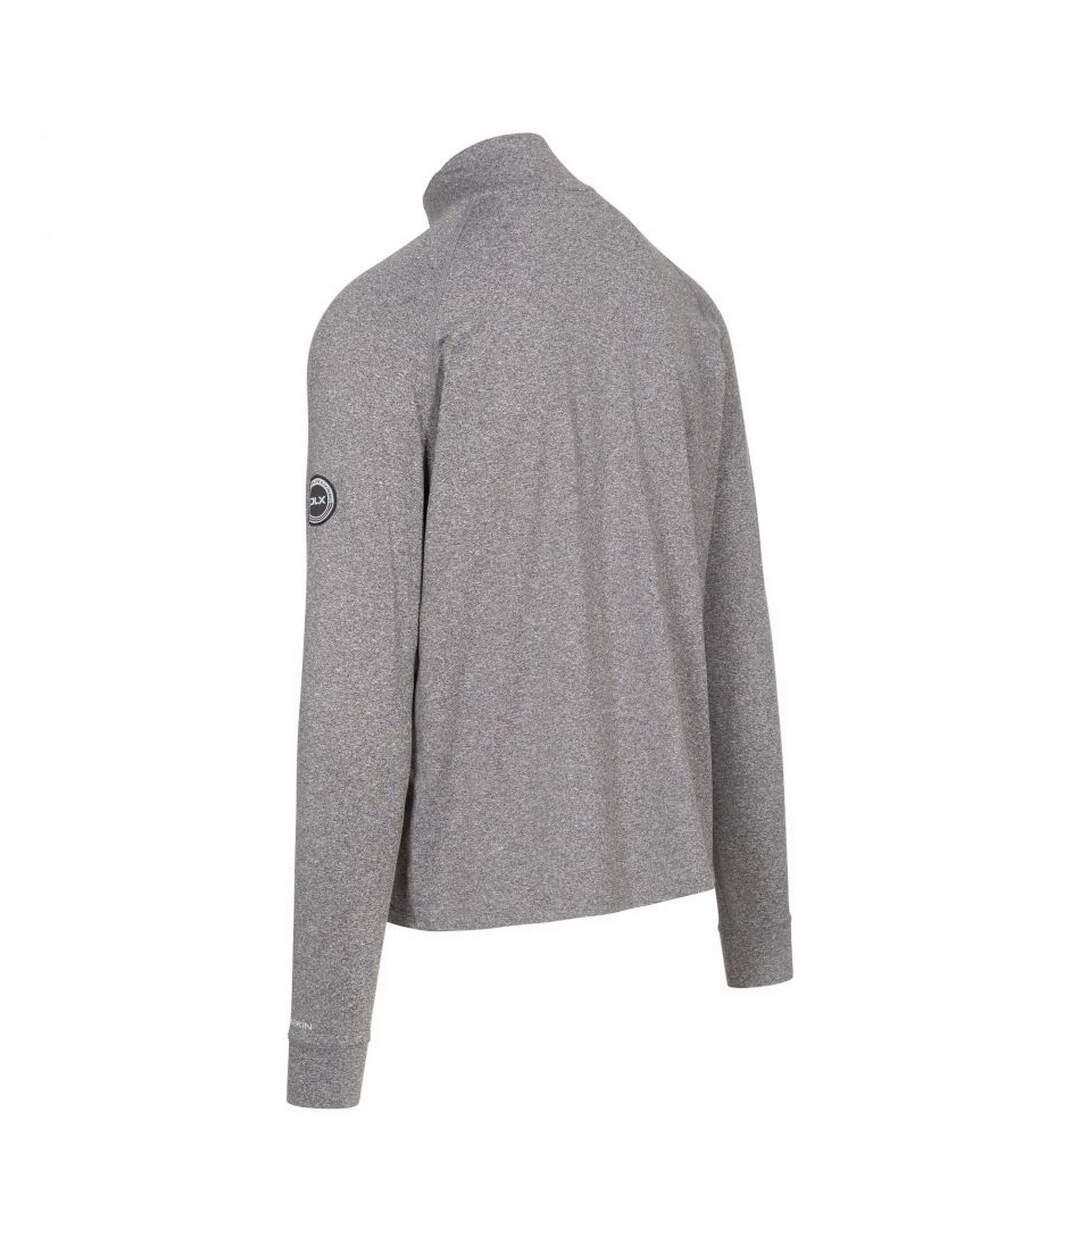 Trespass Mens Nicholas Long-Sleeved Sports Top (Grey Marl) - UTTP5242